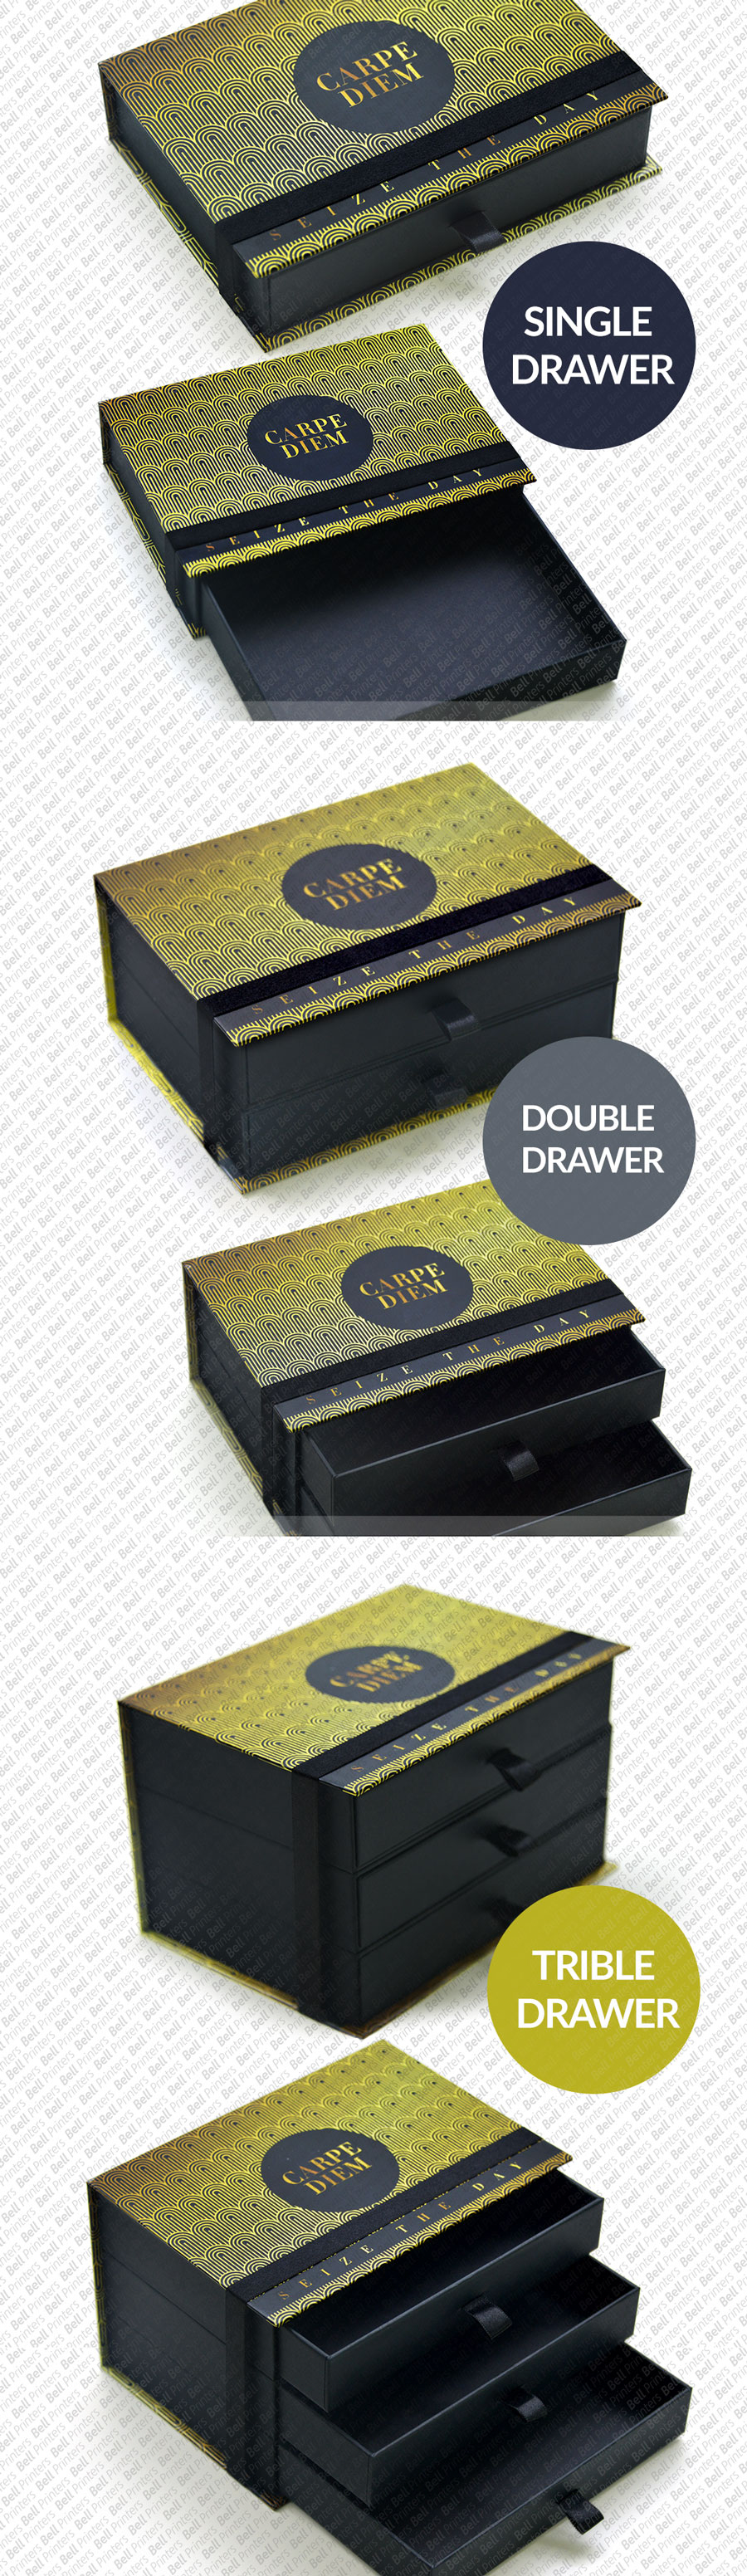 luxury drawer boxes india | custom gift boxes | Premium Box